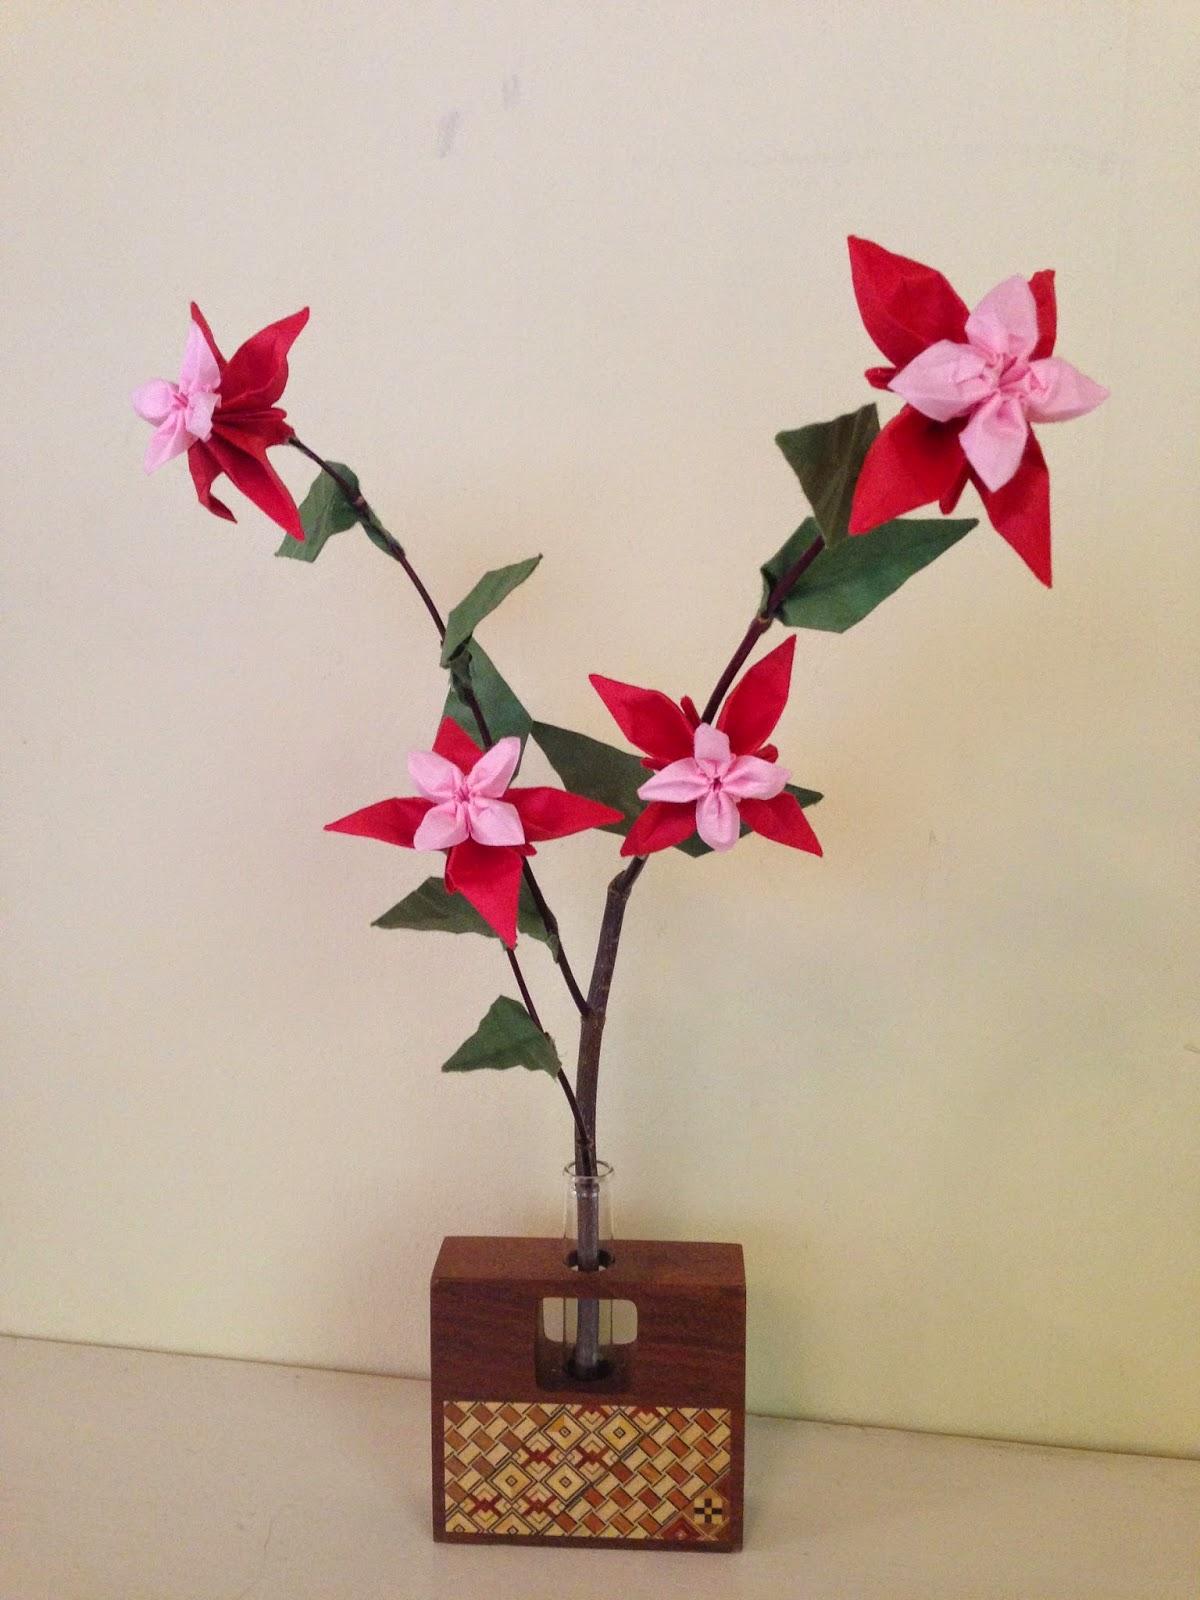 Yuki39s Origami Blog Review Origami Ikebana By Benjamin John Coleman